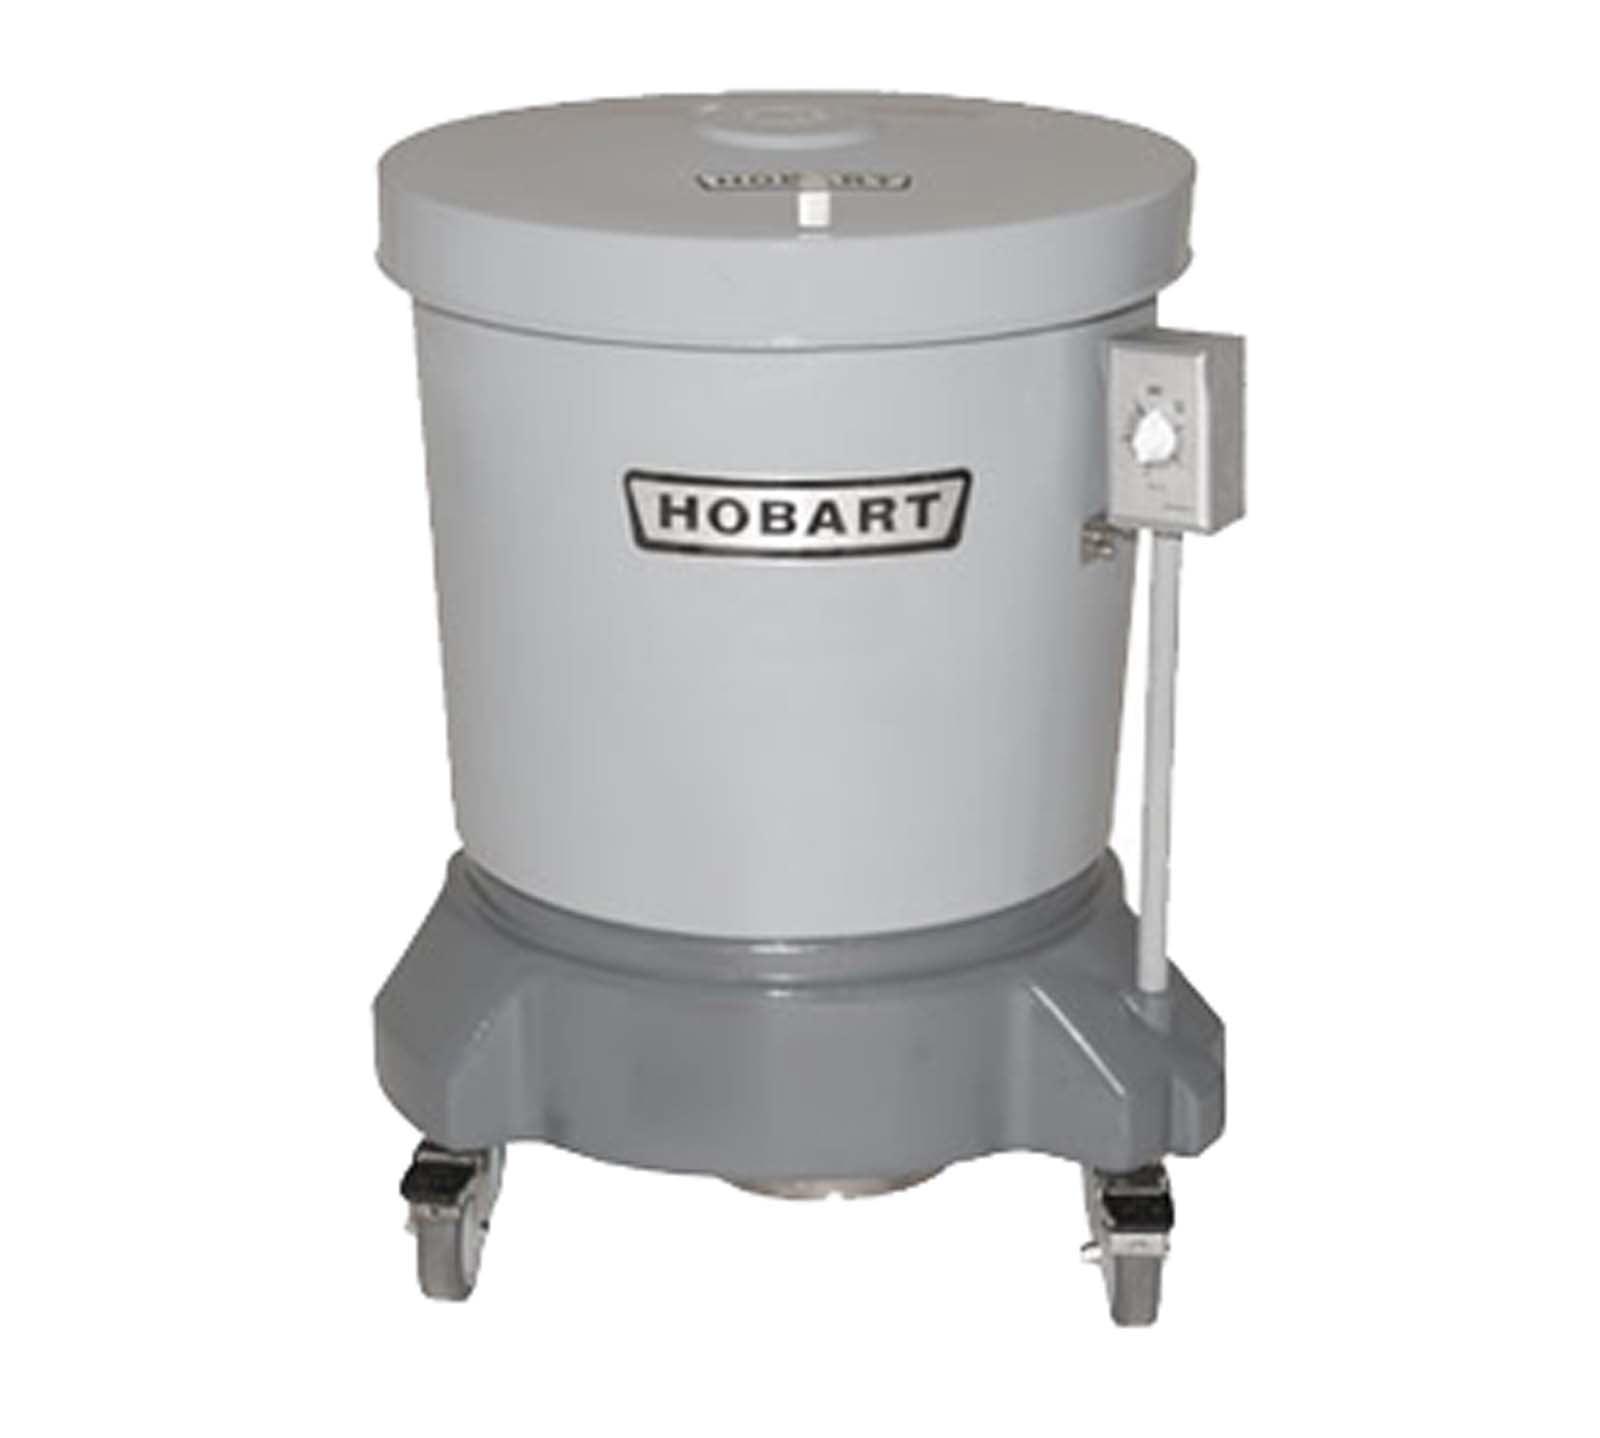 Hobart SDPE-11 Single Phase Polyethylene Salad Dryer with 20 Gallon Capacity by